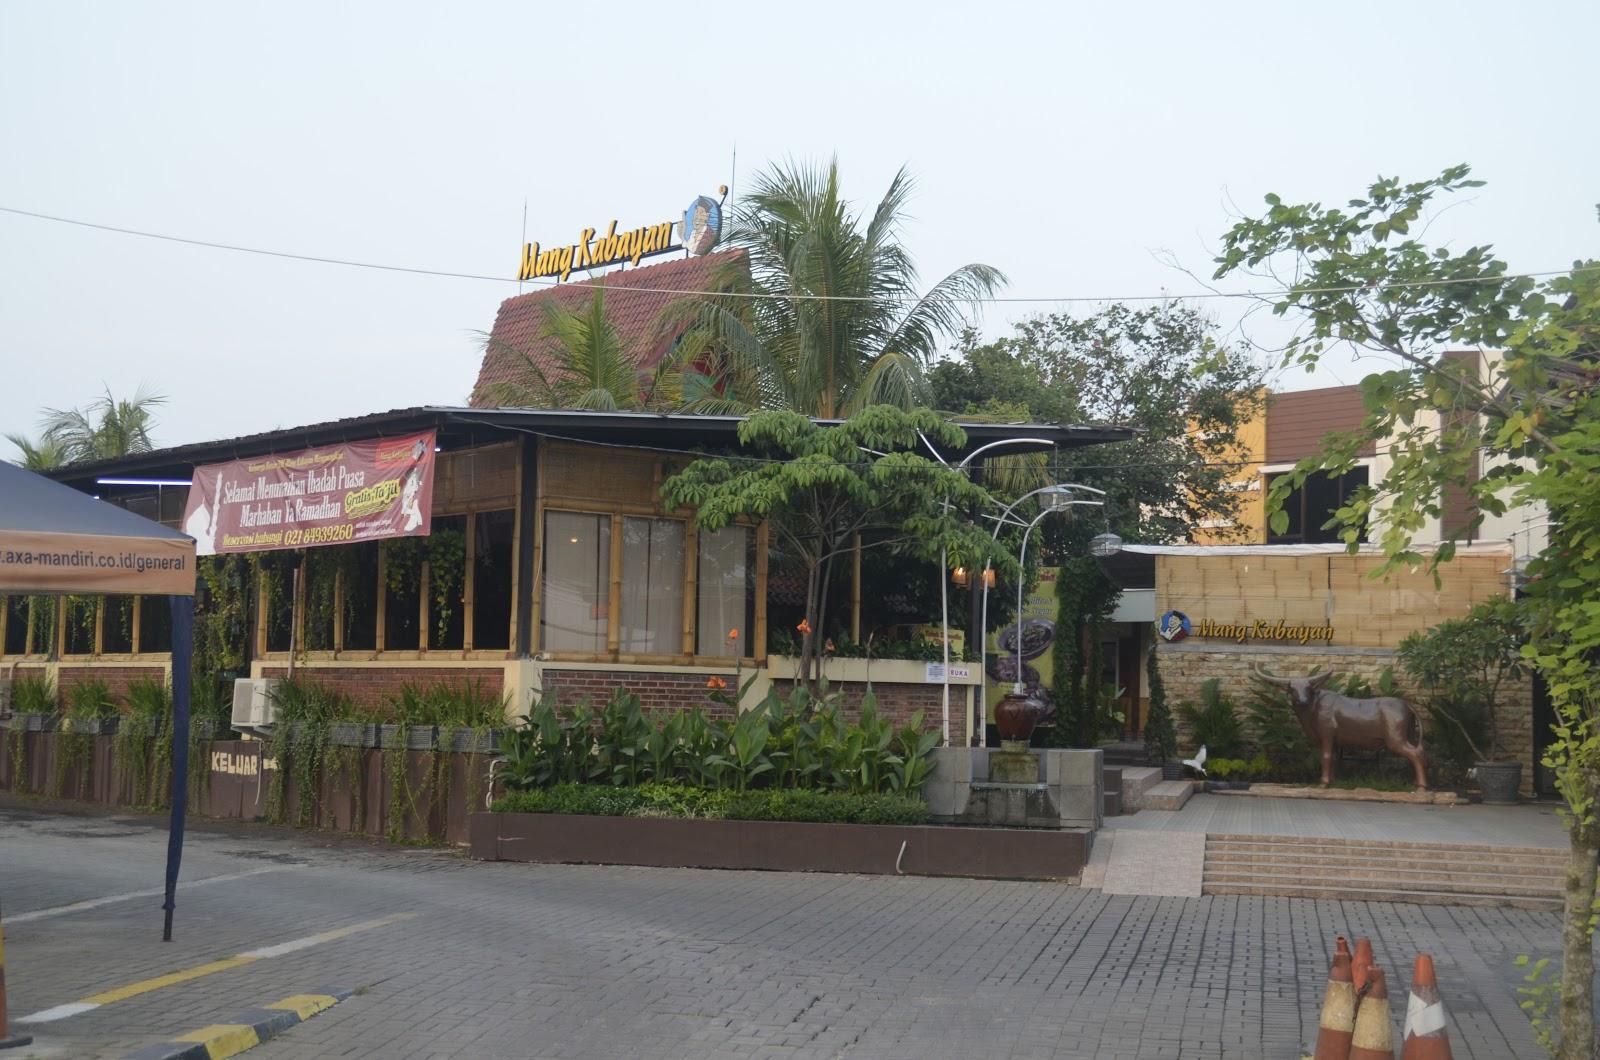 http://mangkabayan68.blogspot.co.id/2016/06/kota-wisata.html